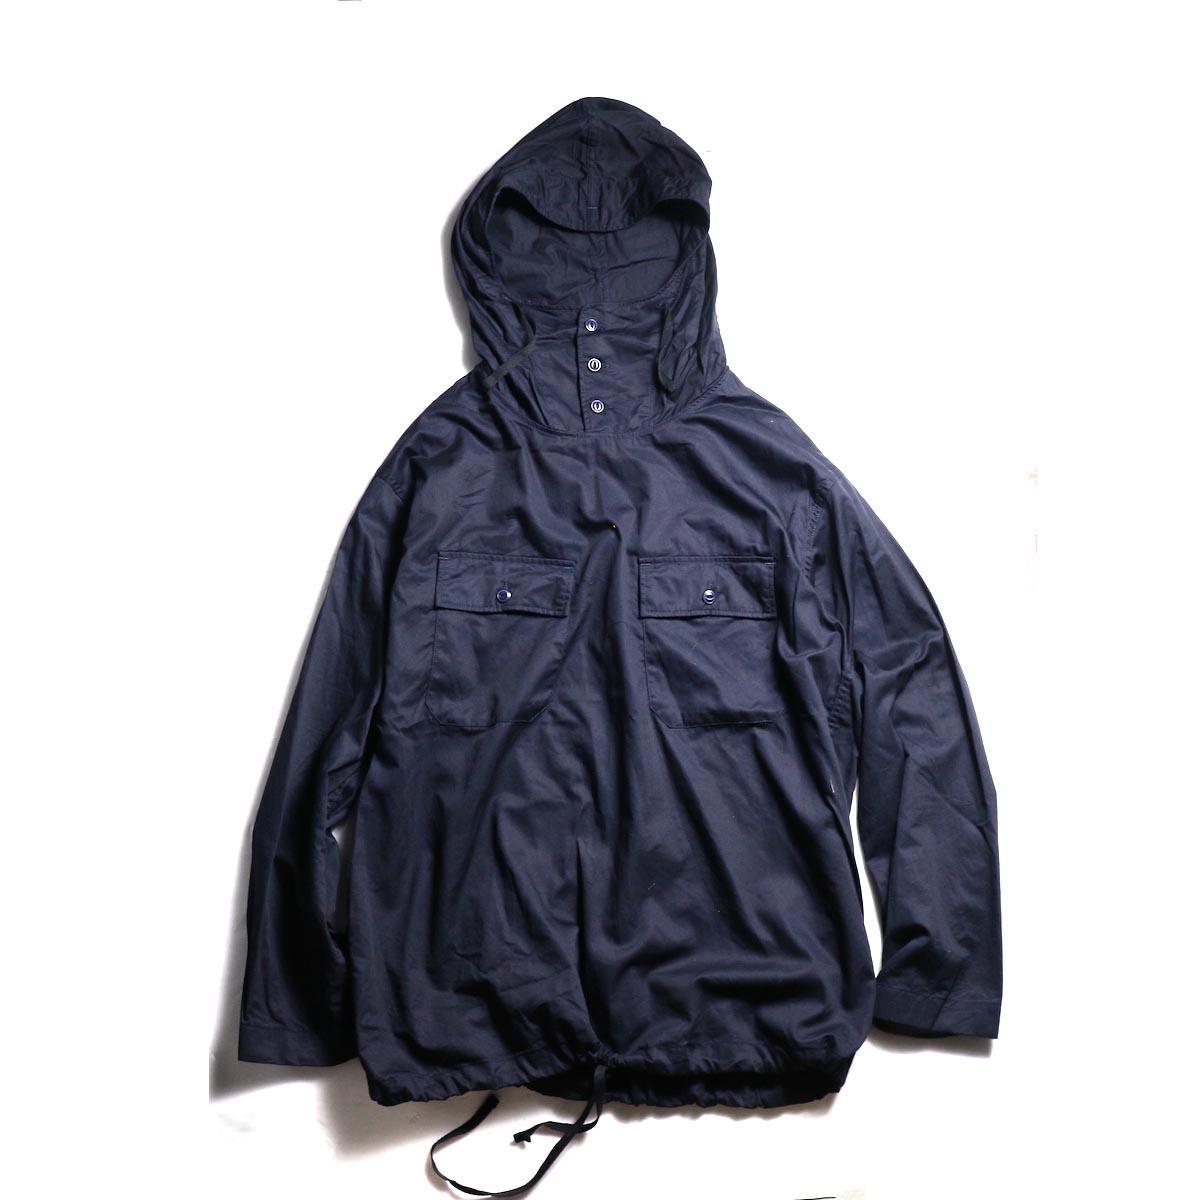 Engineered Garments / Cagoule Shirt -Fineline Twill (Dk.Navy)